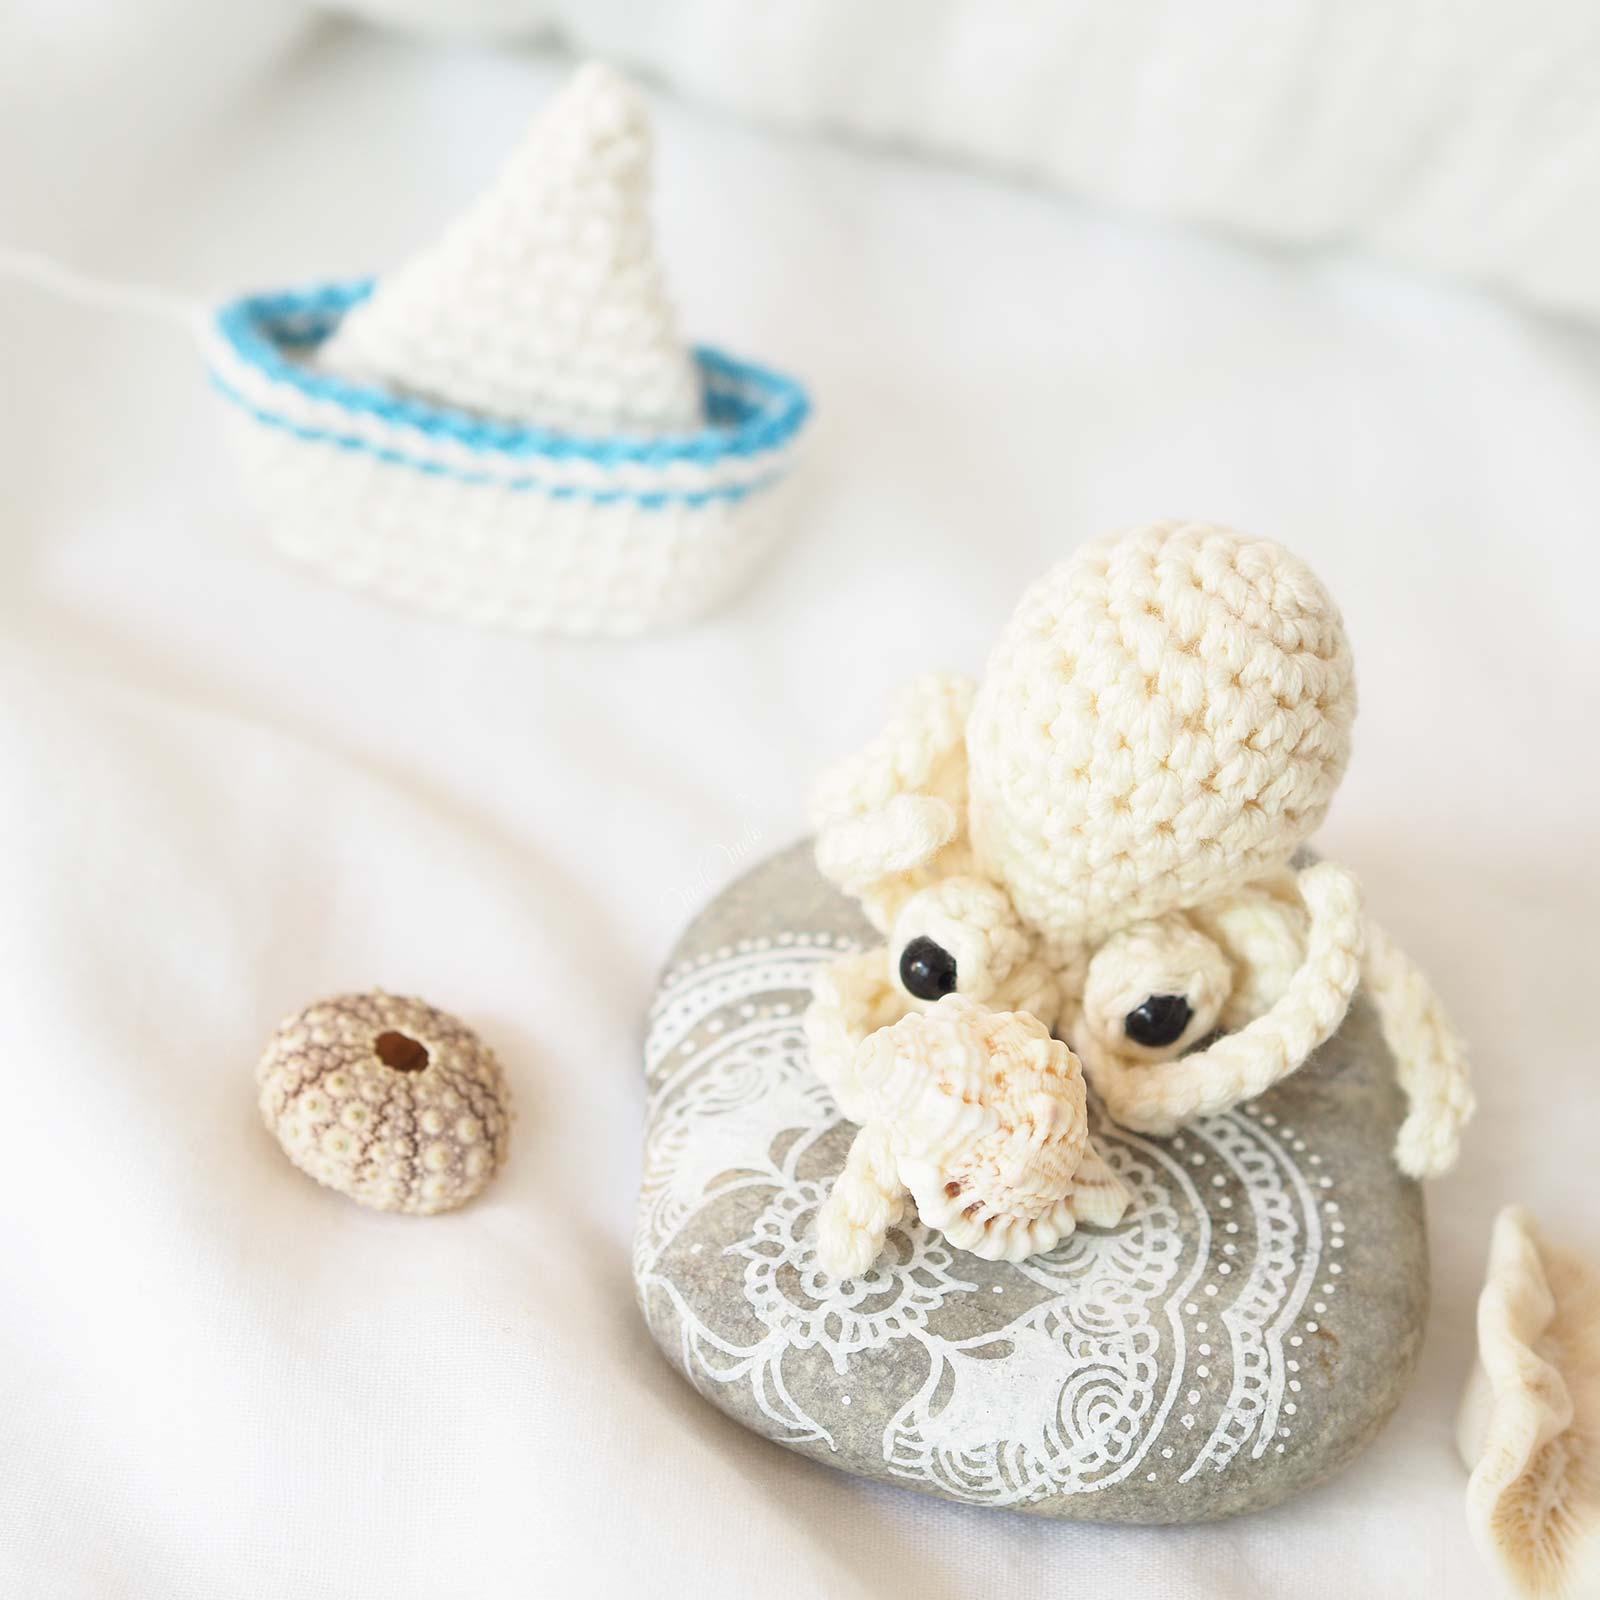 mini-poulpe-coquillage-crochet-amigurumi-laboutiquedemelimelo